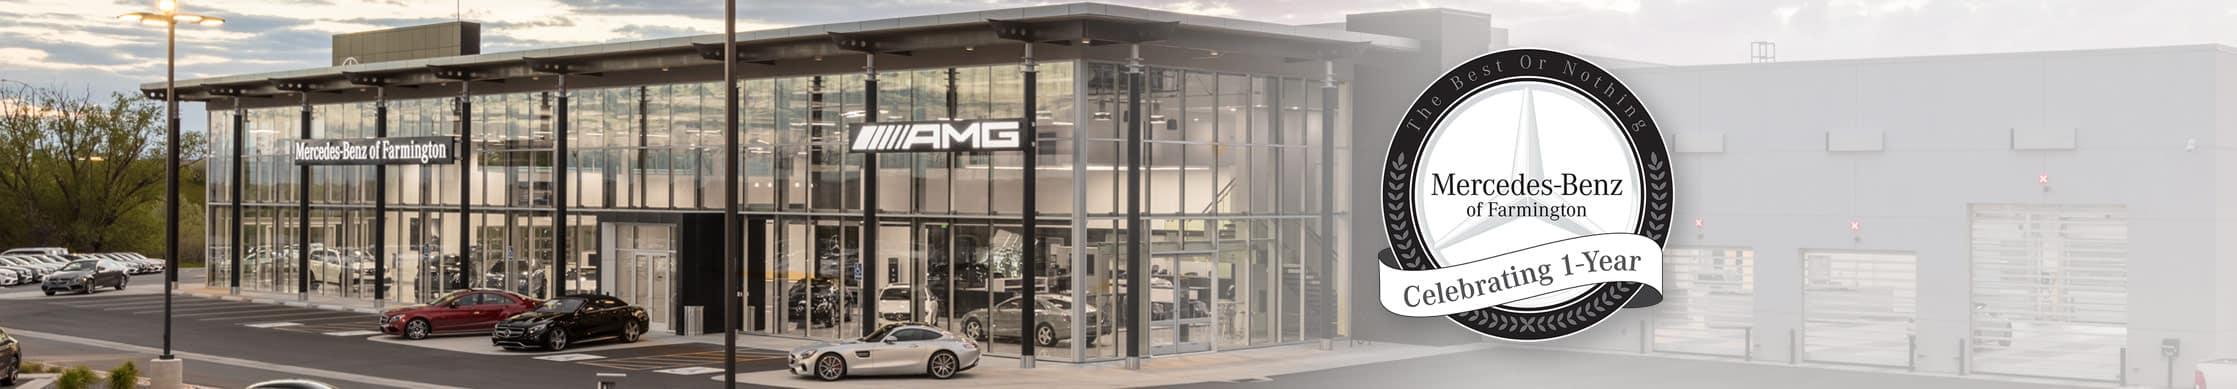 Mercedes Benz Of Farmington >> Mercedes Benz Of Farmington Anniversary Mercedes Benz Of